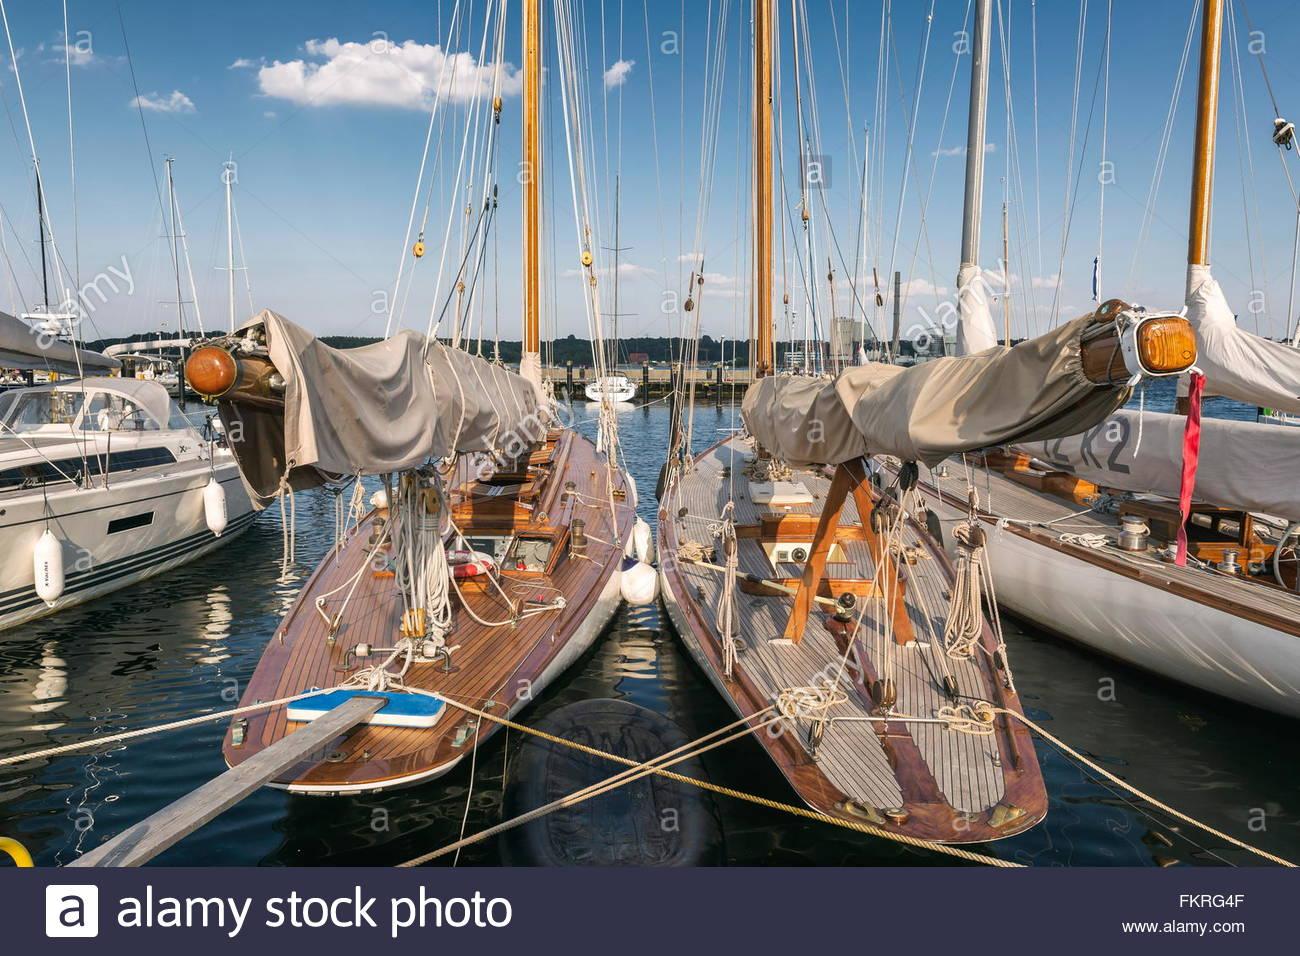 Klassische segelyachten  Klassische Segelyachten bin Kieler Yachtclub Stockfoto, Bild ...